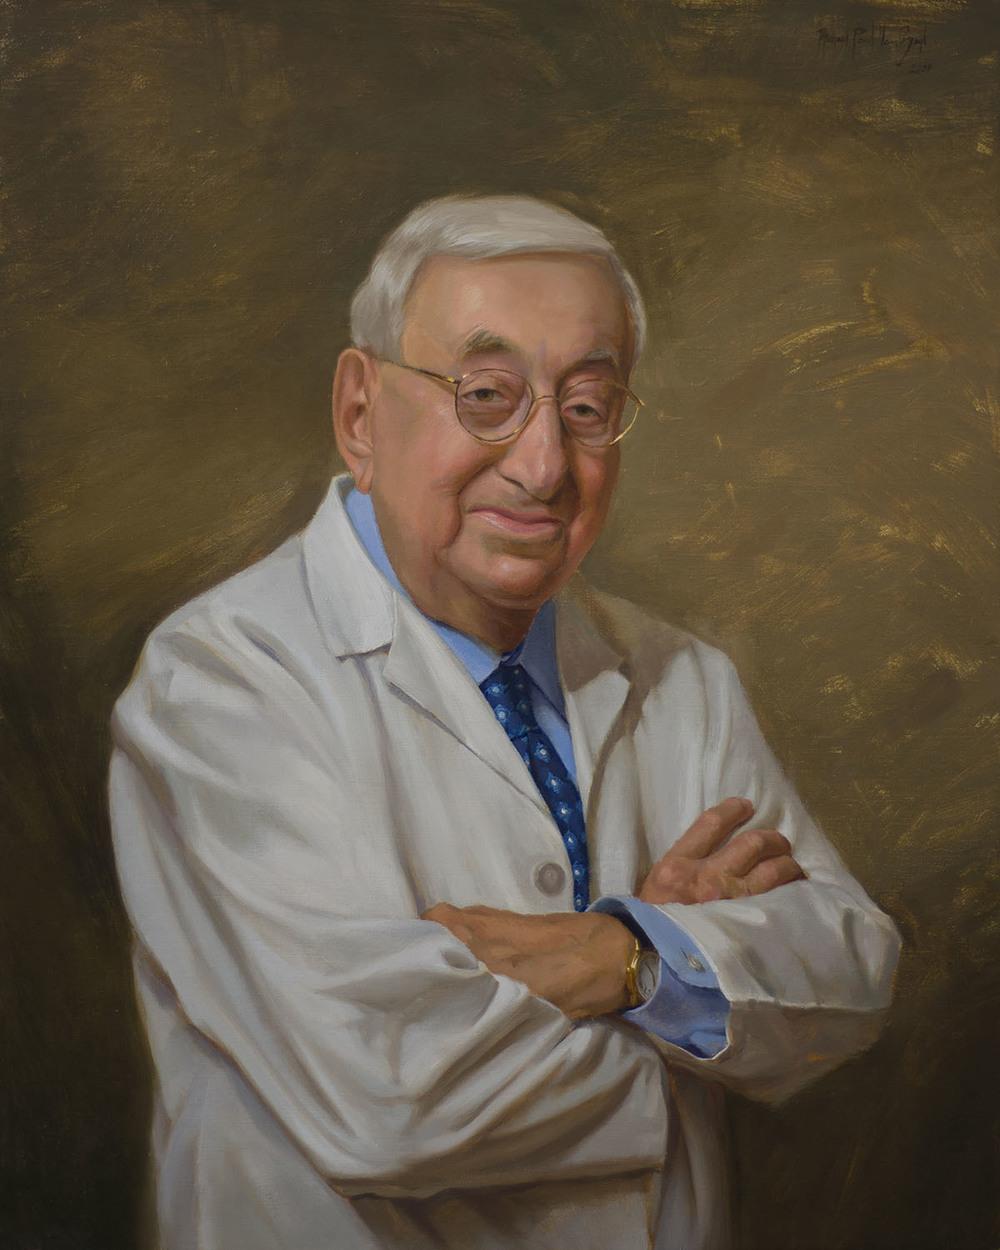 Dr. Joseph B. Kirsner